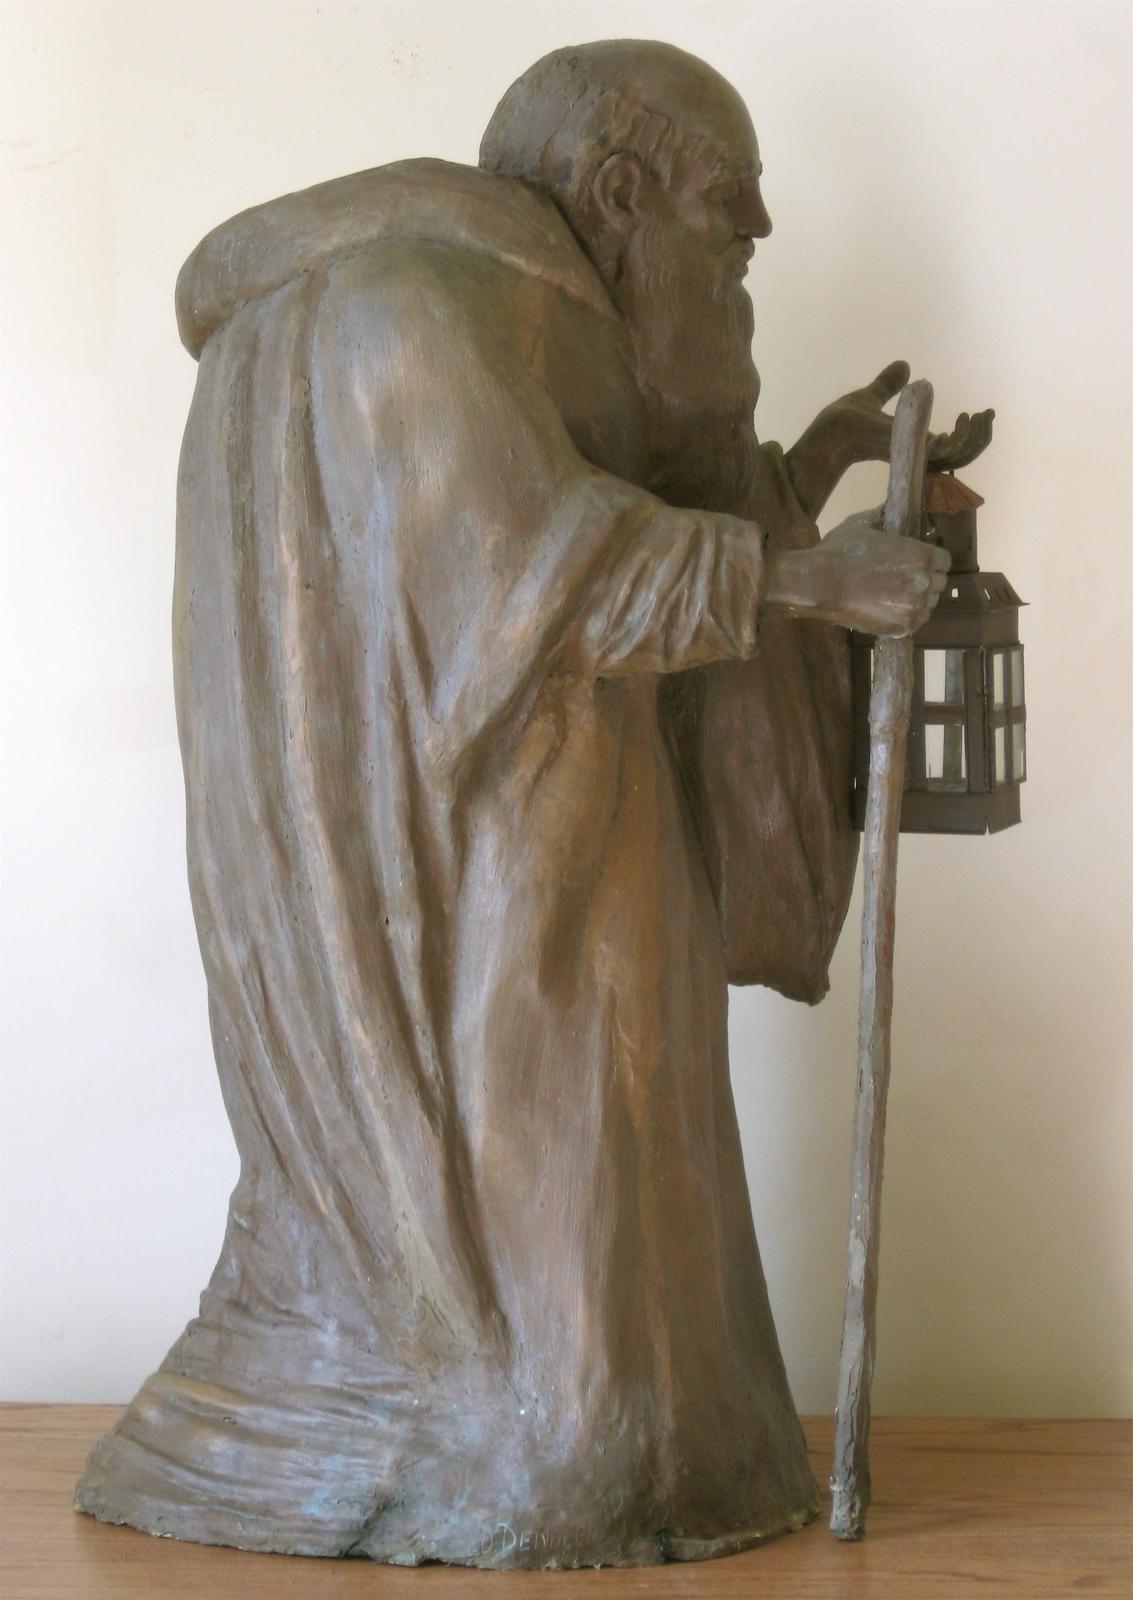 Deborah   Dendler    Diogenes    Epoxy bronze, wood, tin, glass, wax    NFS